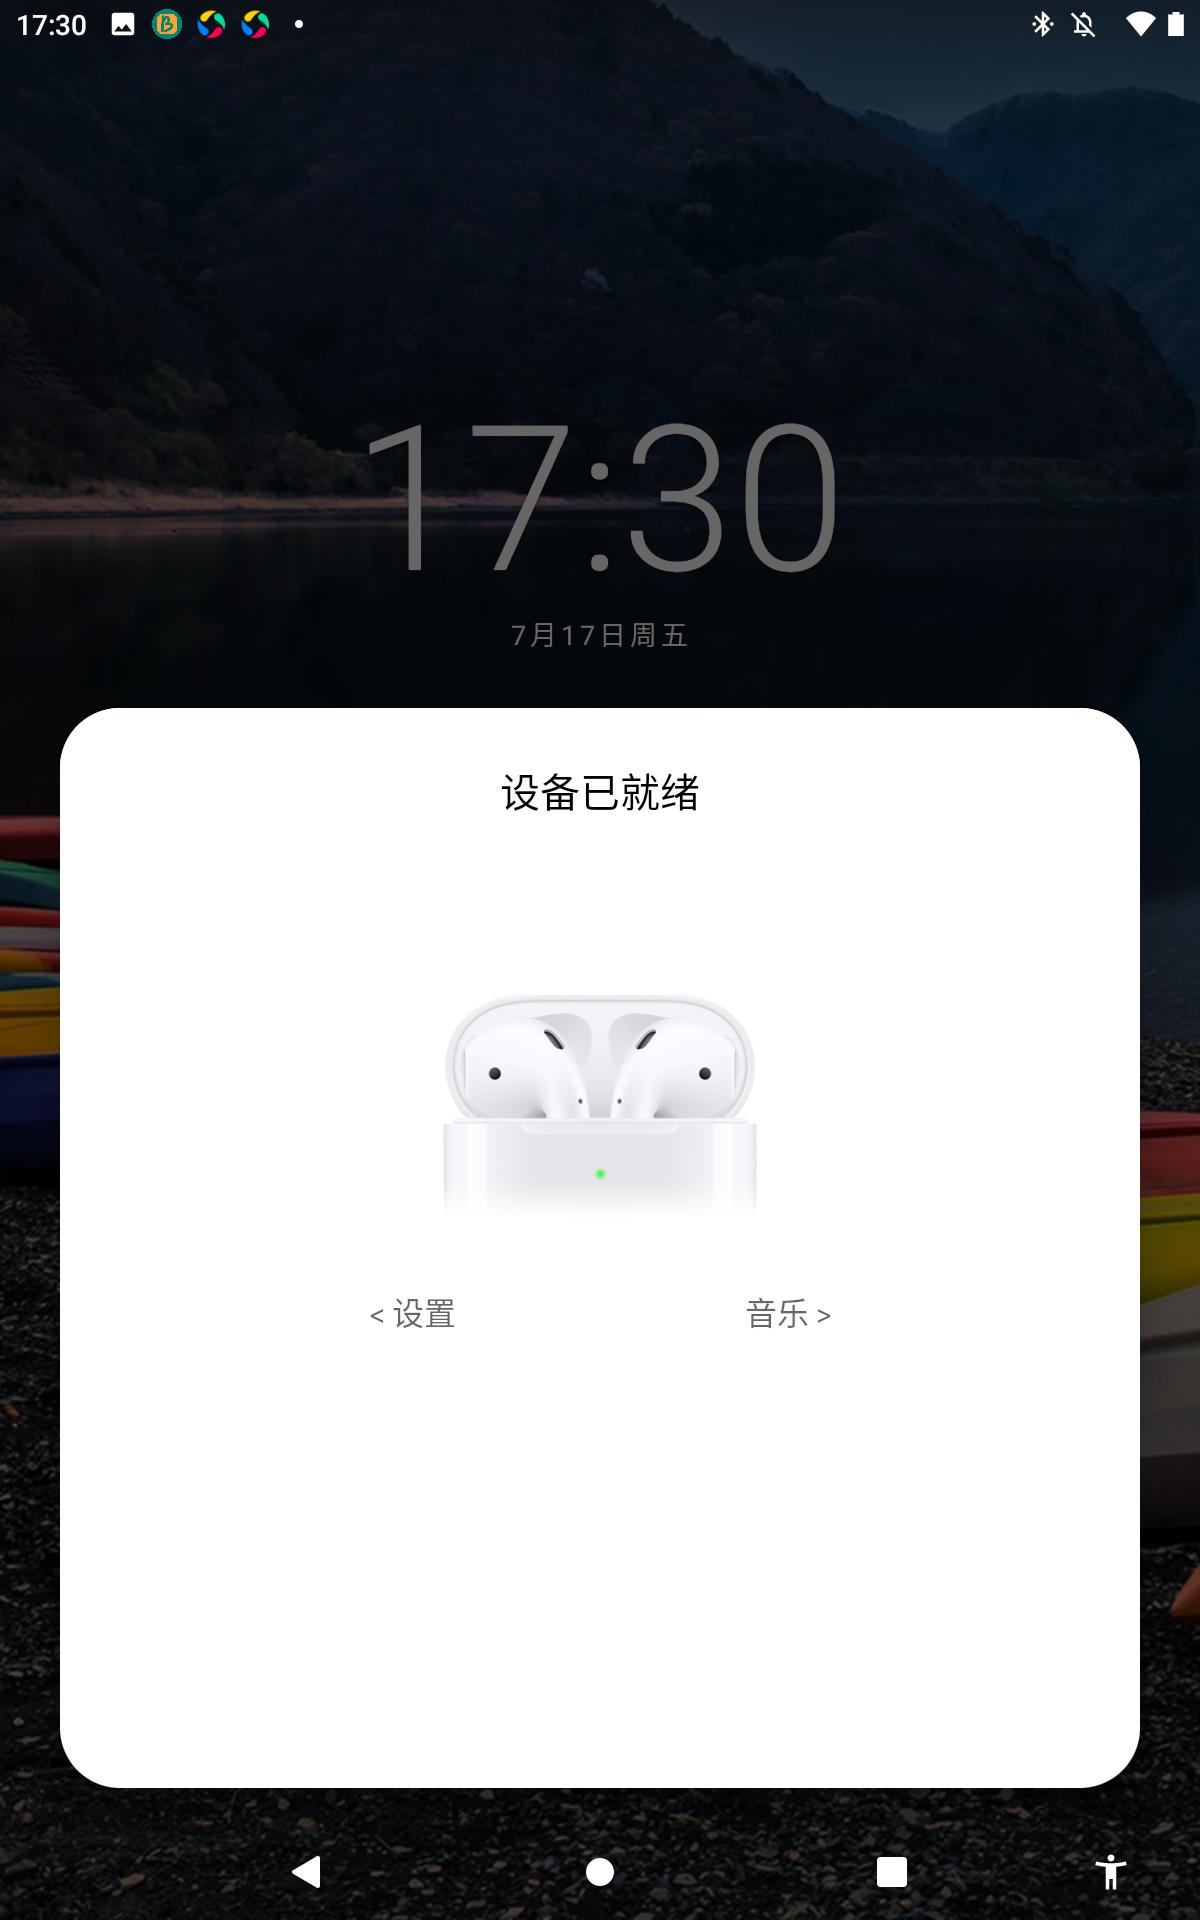 Screenshot_20200717-173056